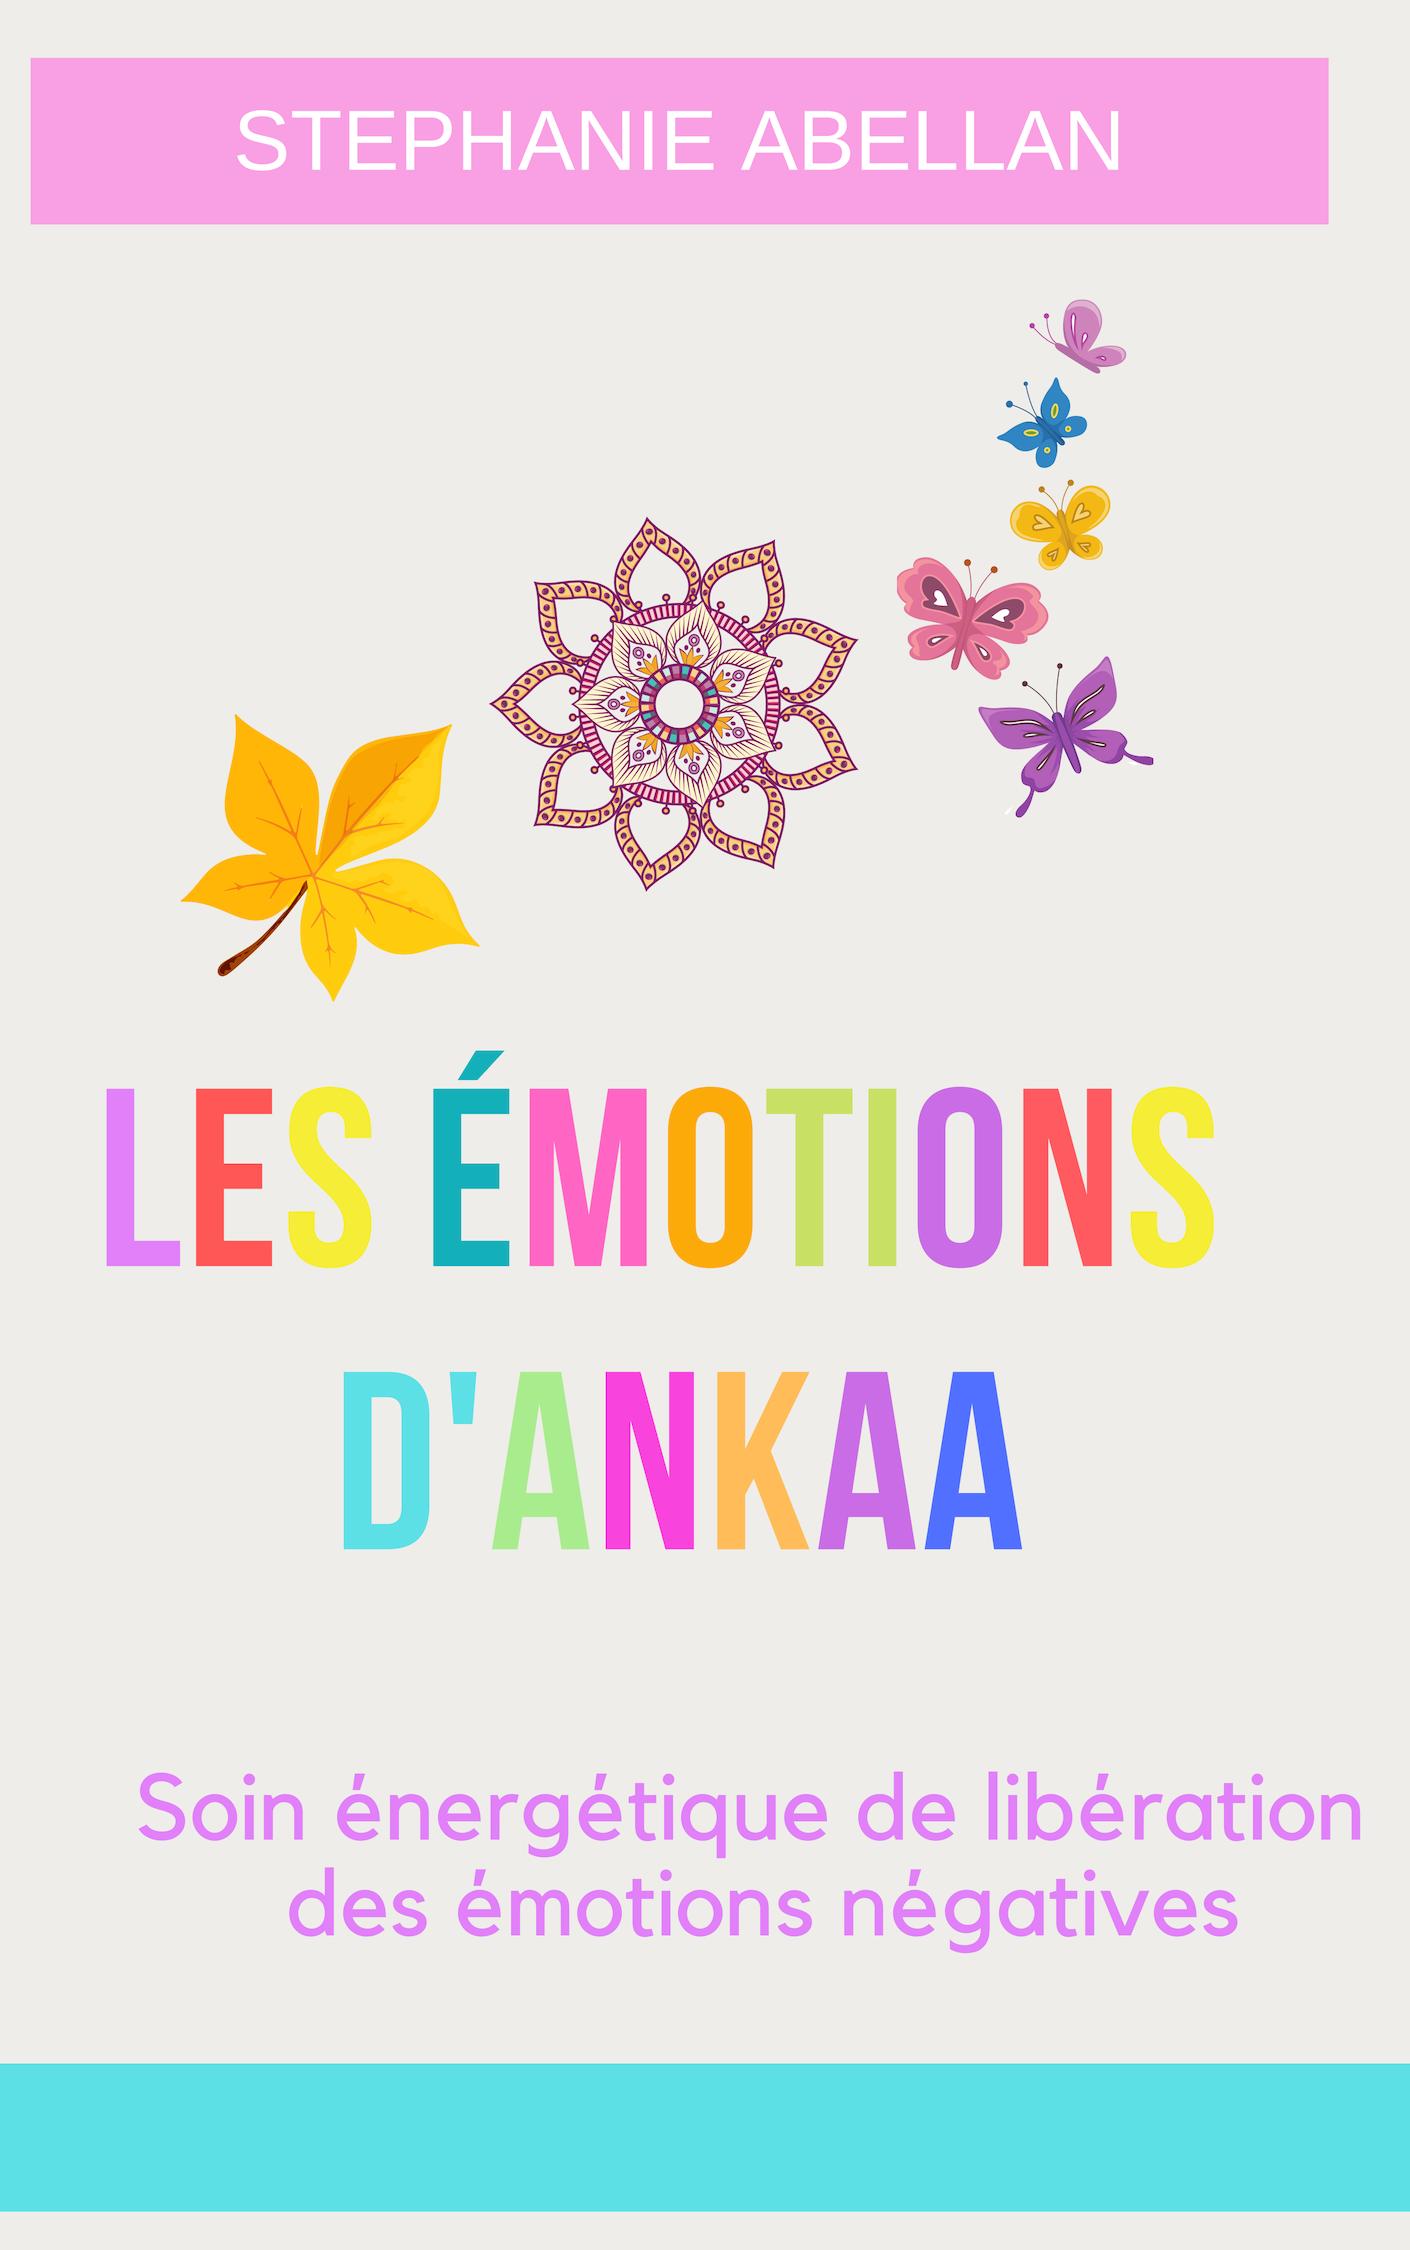 LES EMOTIONS D\'ANKAA Libération des émotions négatives